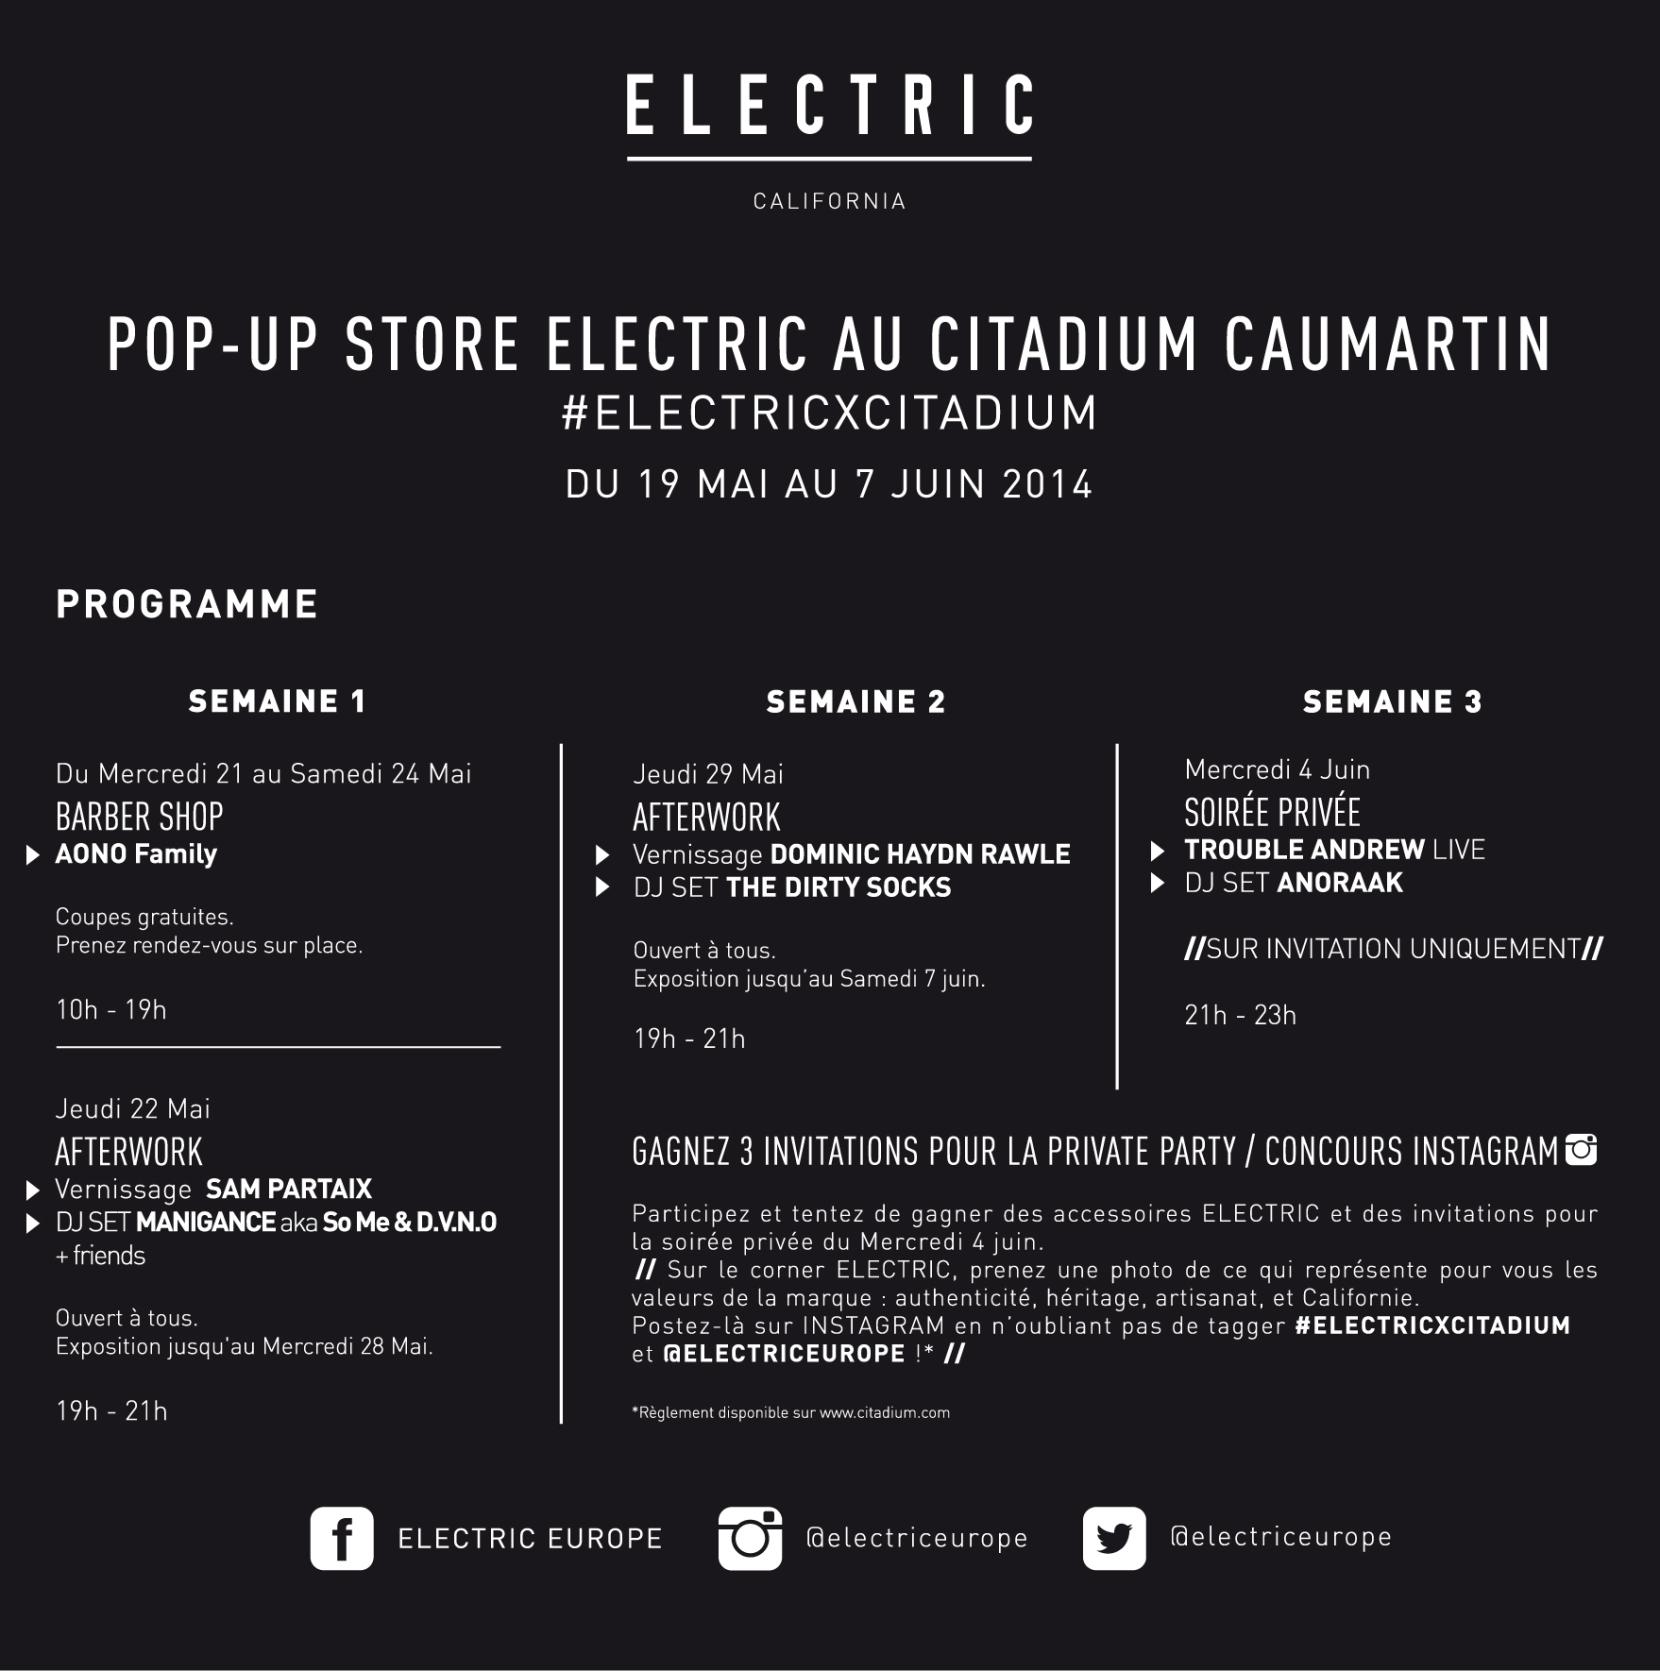 flyer 15x15 PROGRAMME pop-up store citadium final vecto 500 ex